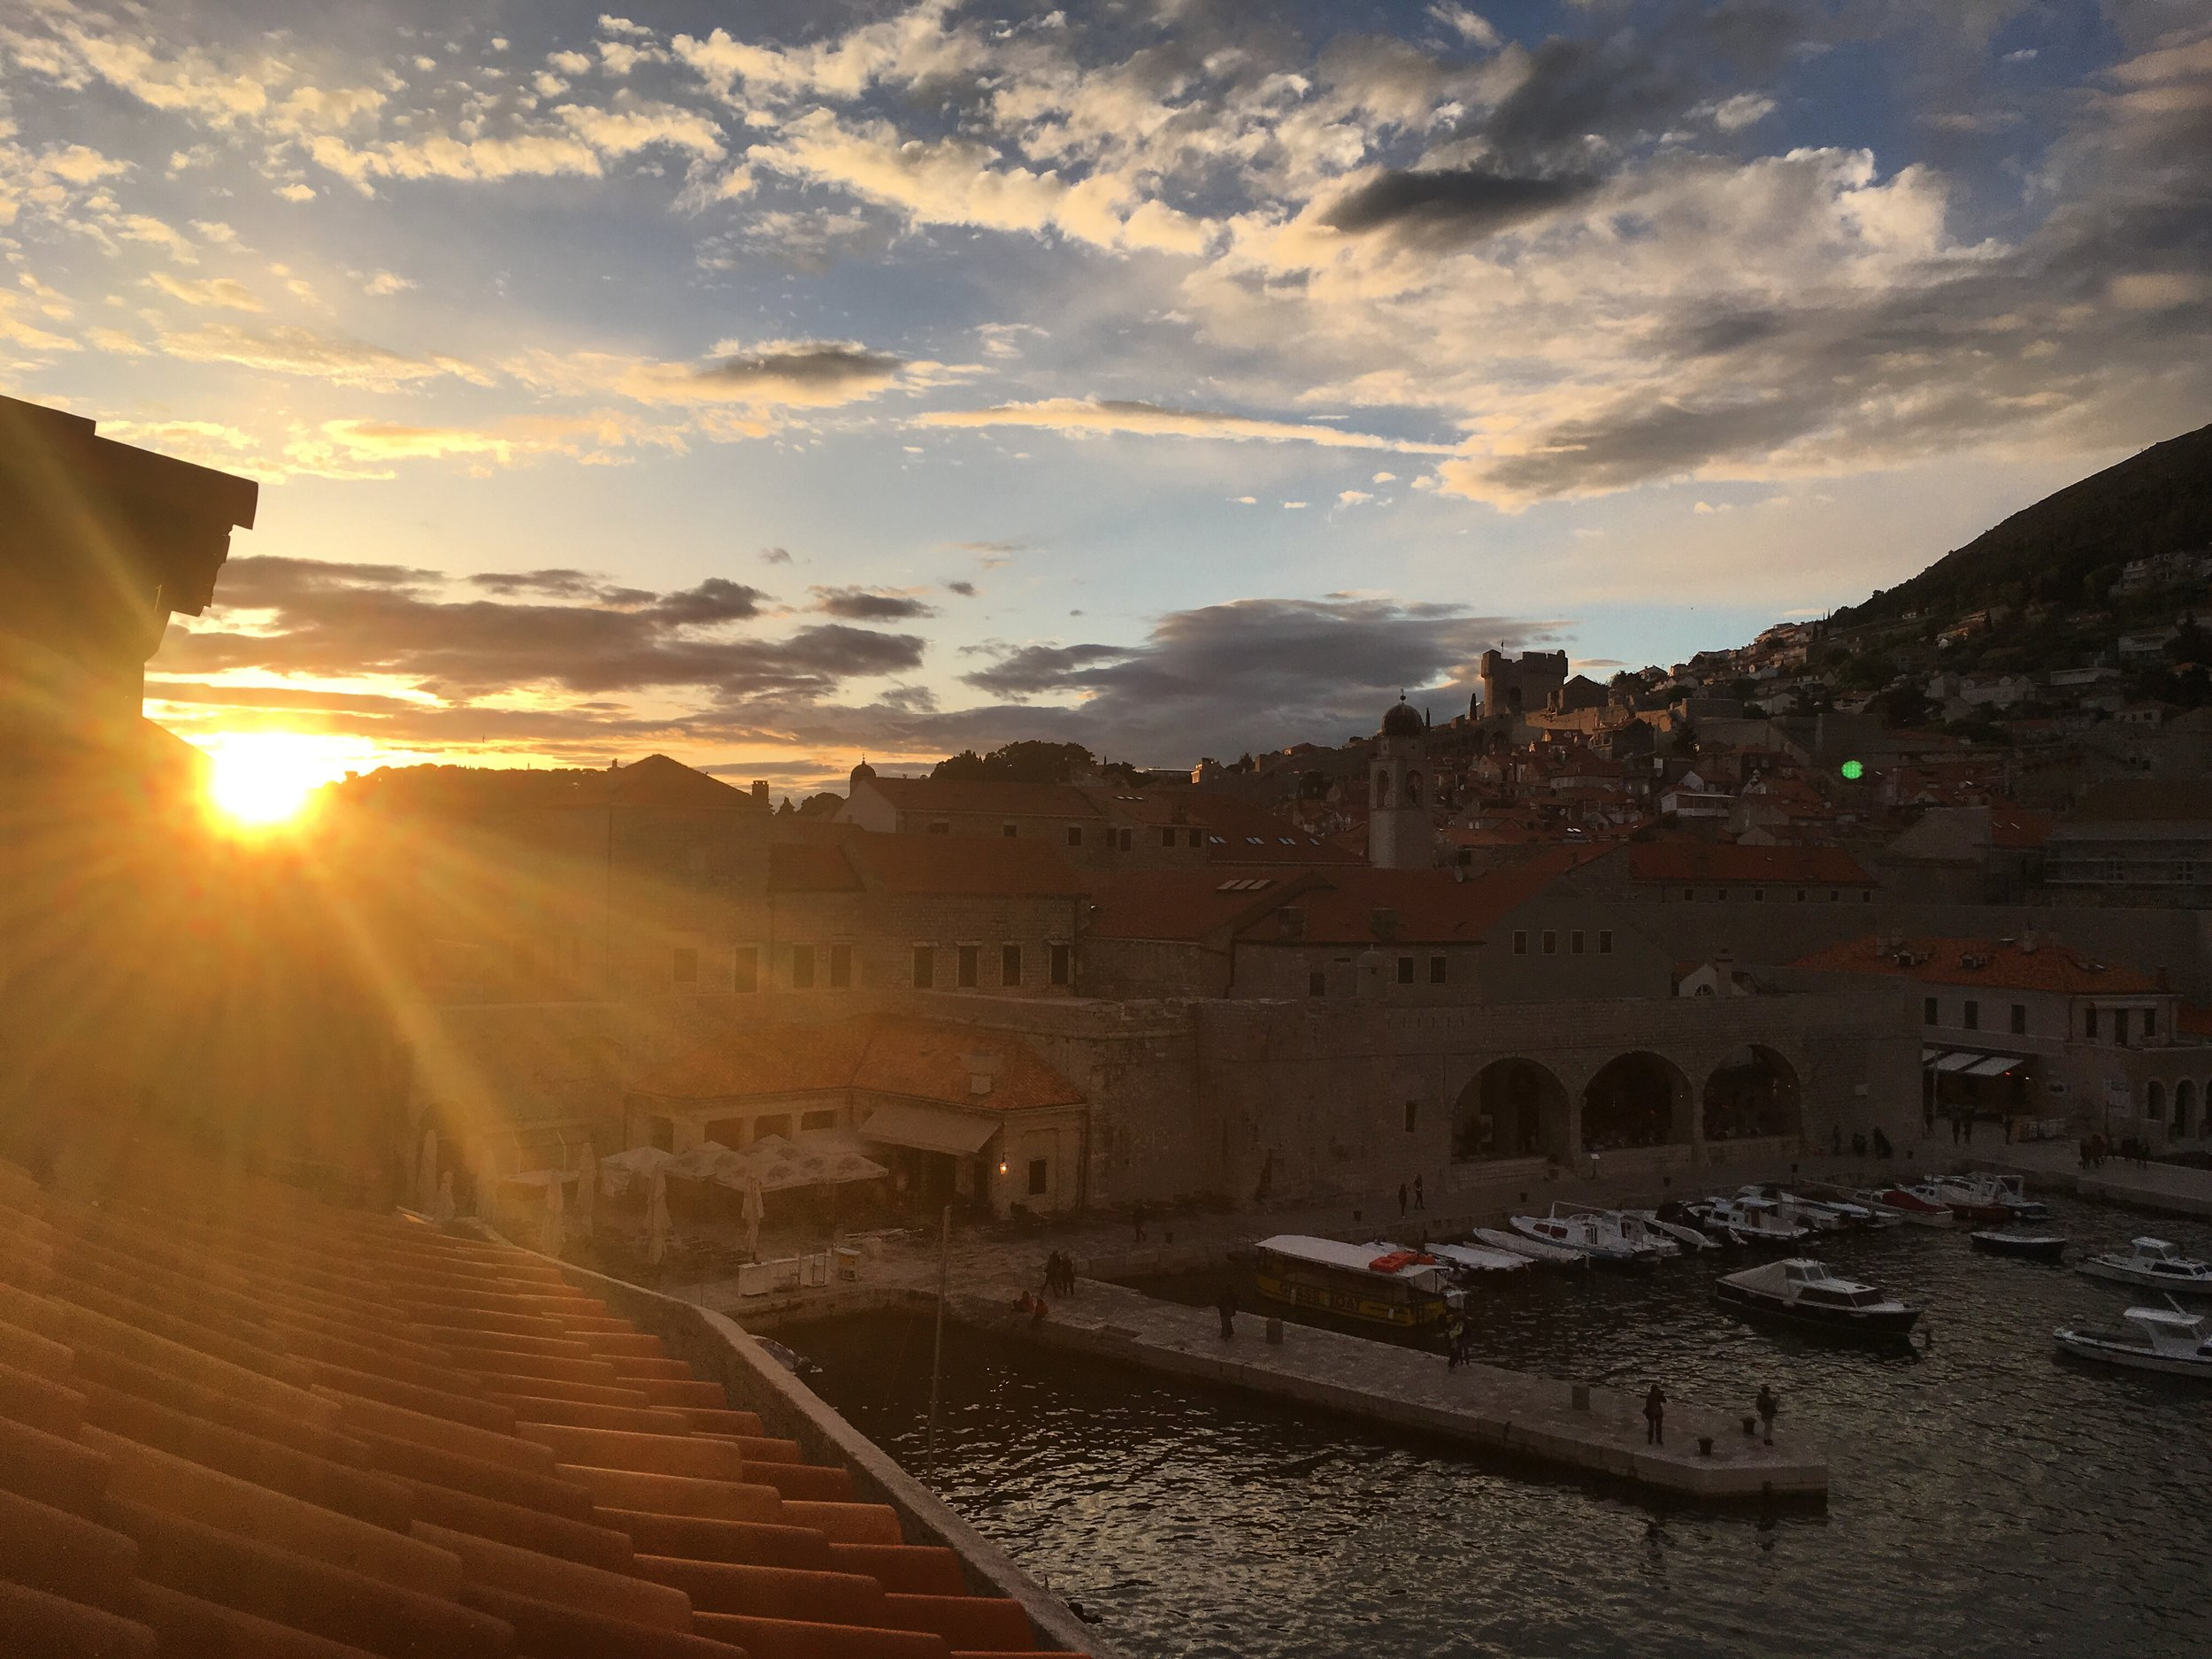 Sunset from Renata's apartment windows